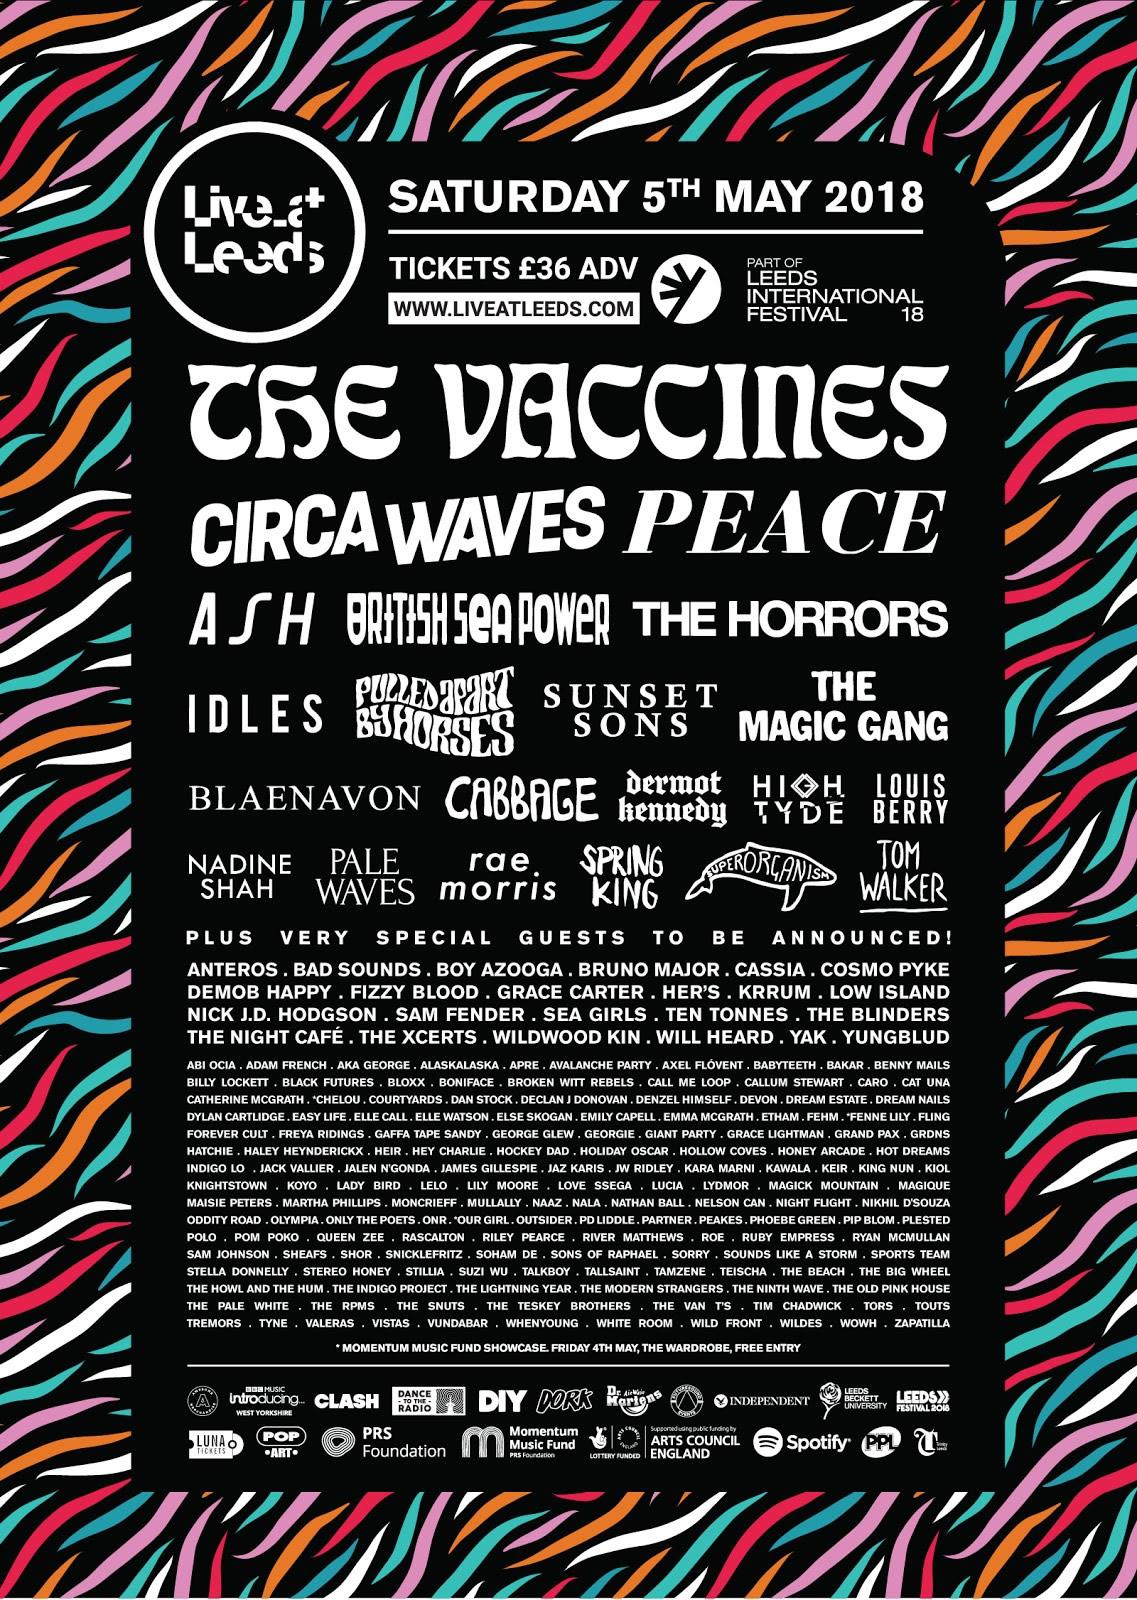 Live At Leeds 2018 2nd line up poster